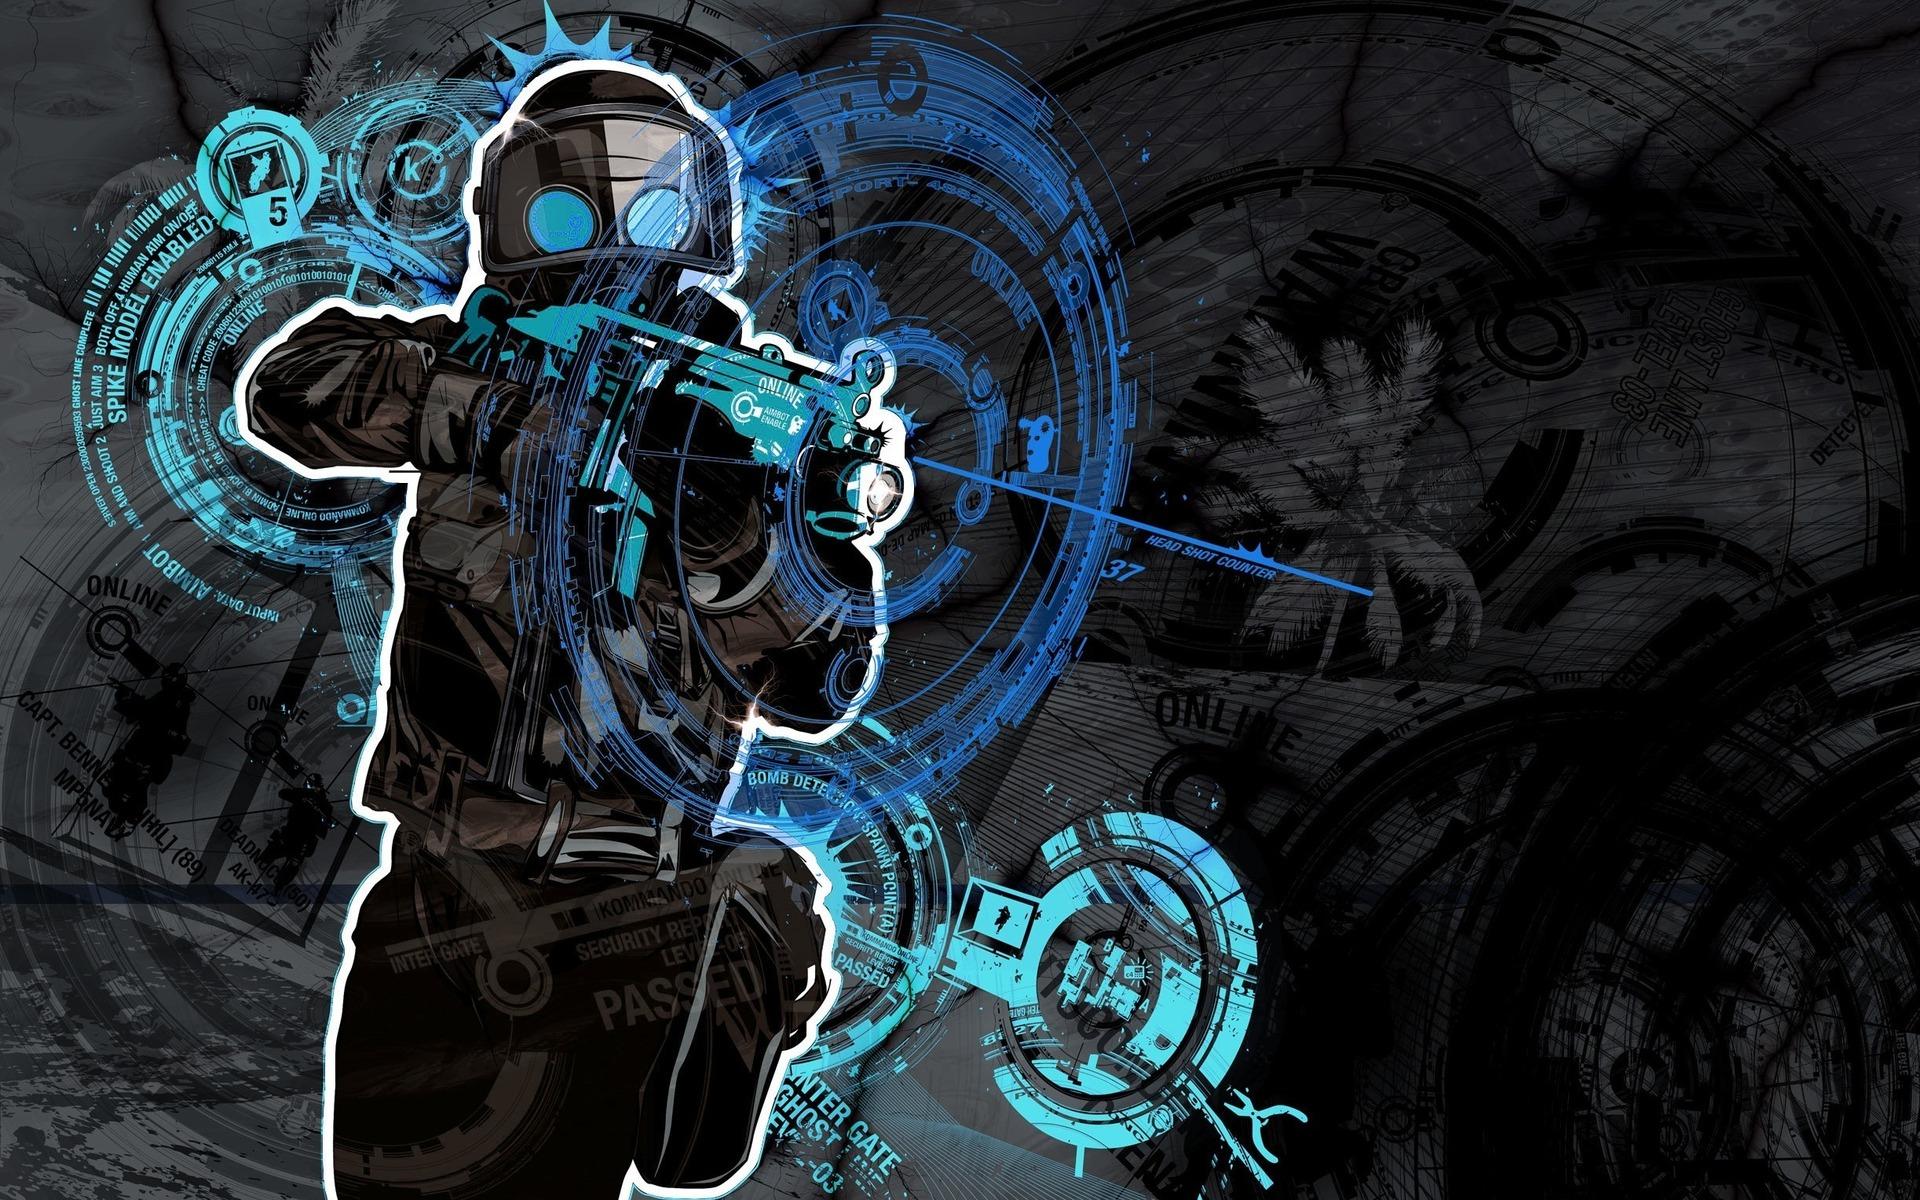 Counter Strike Hd Widescreen Wallpaper Myhacks4you